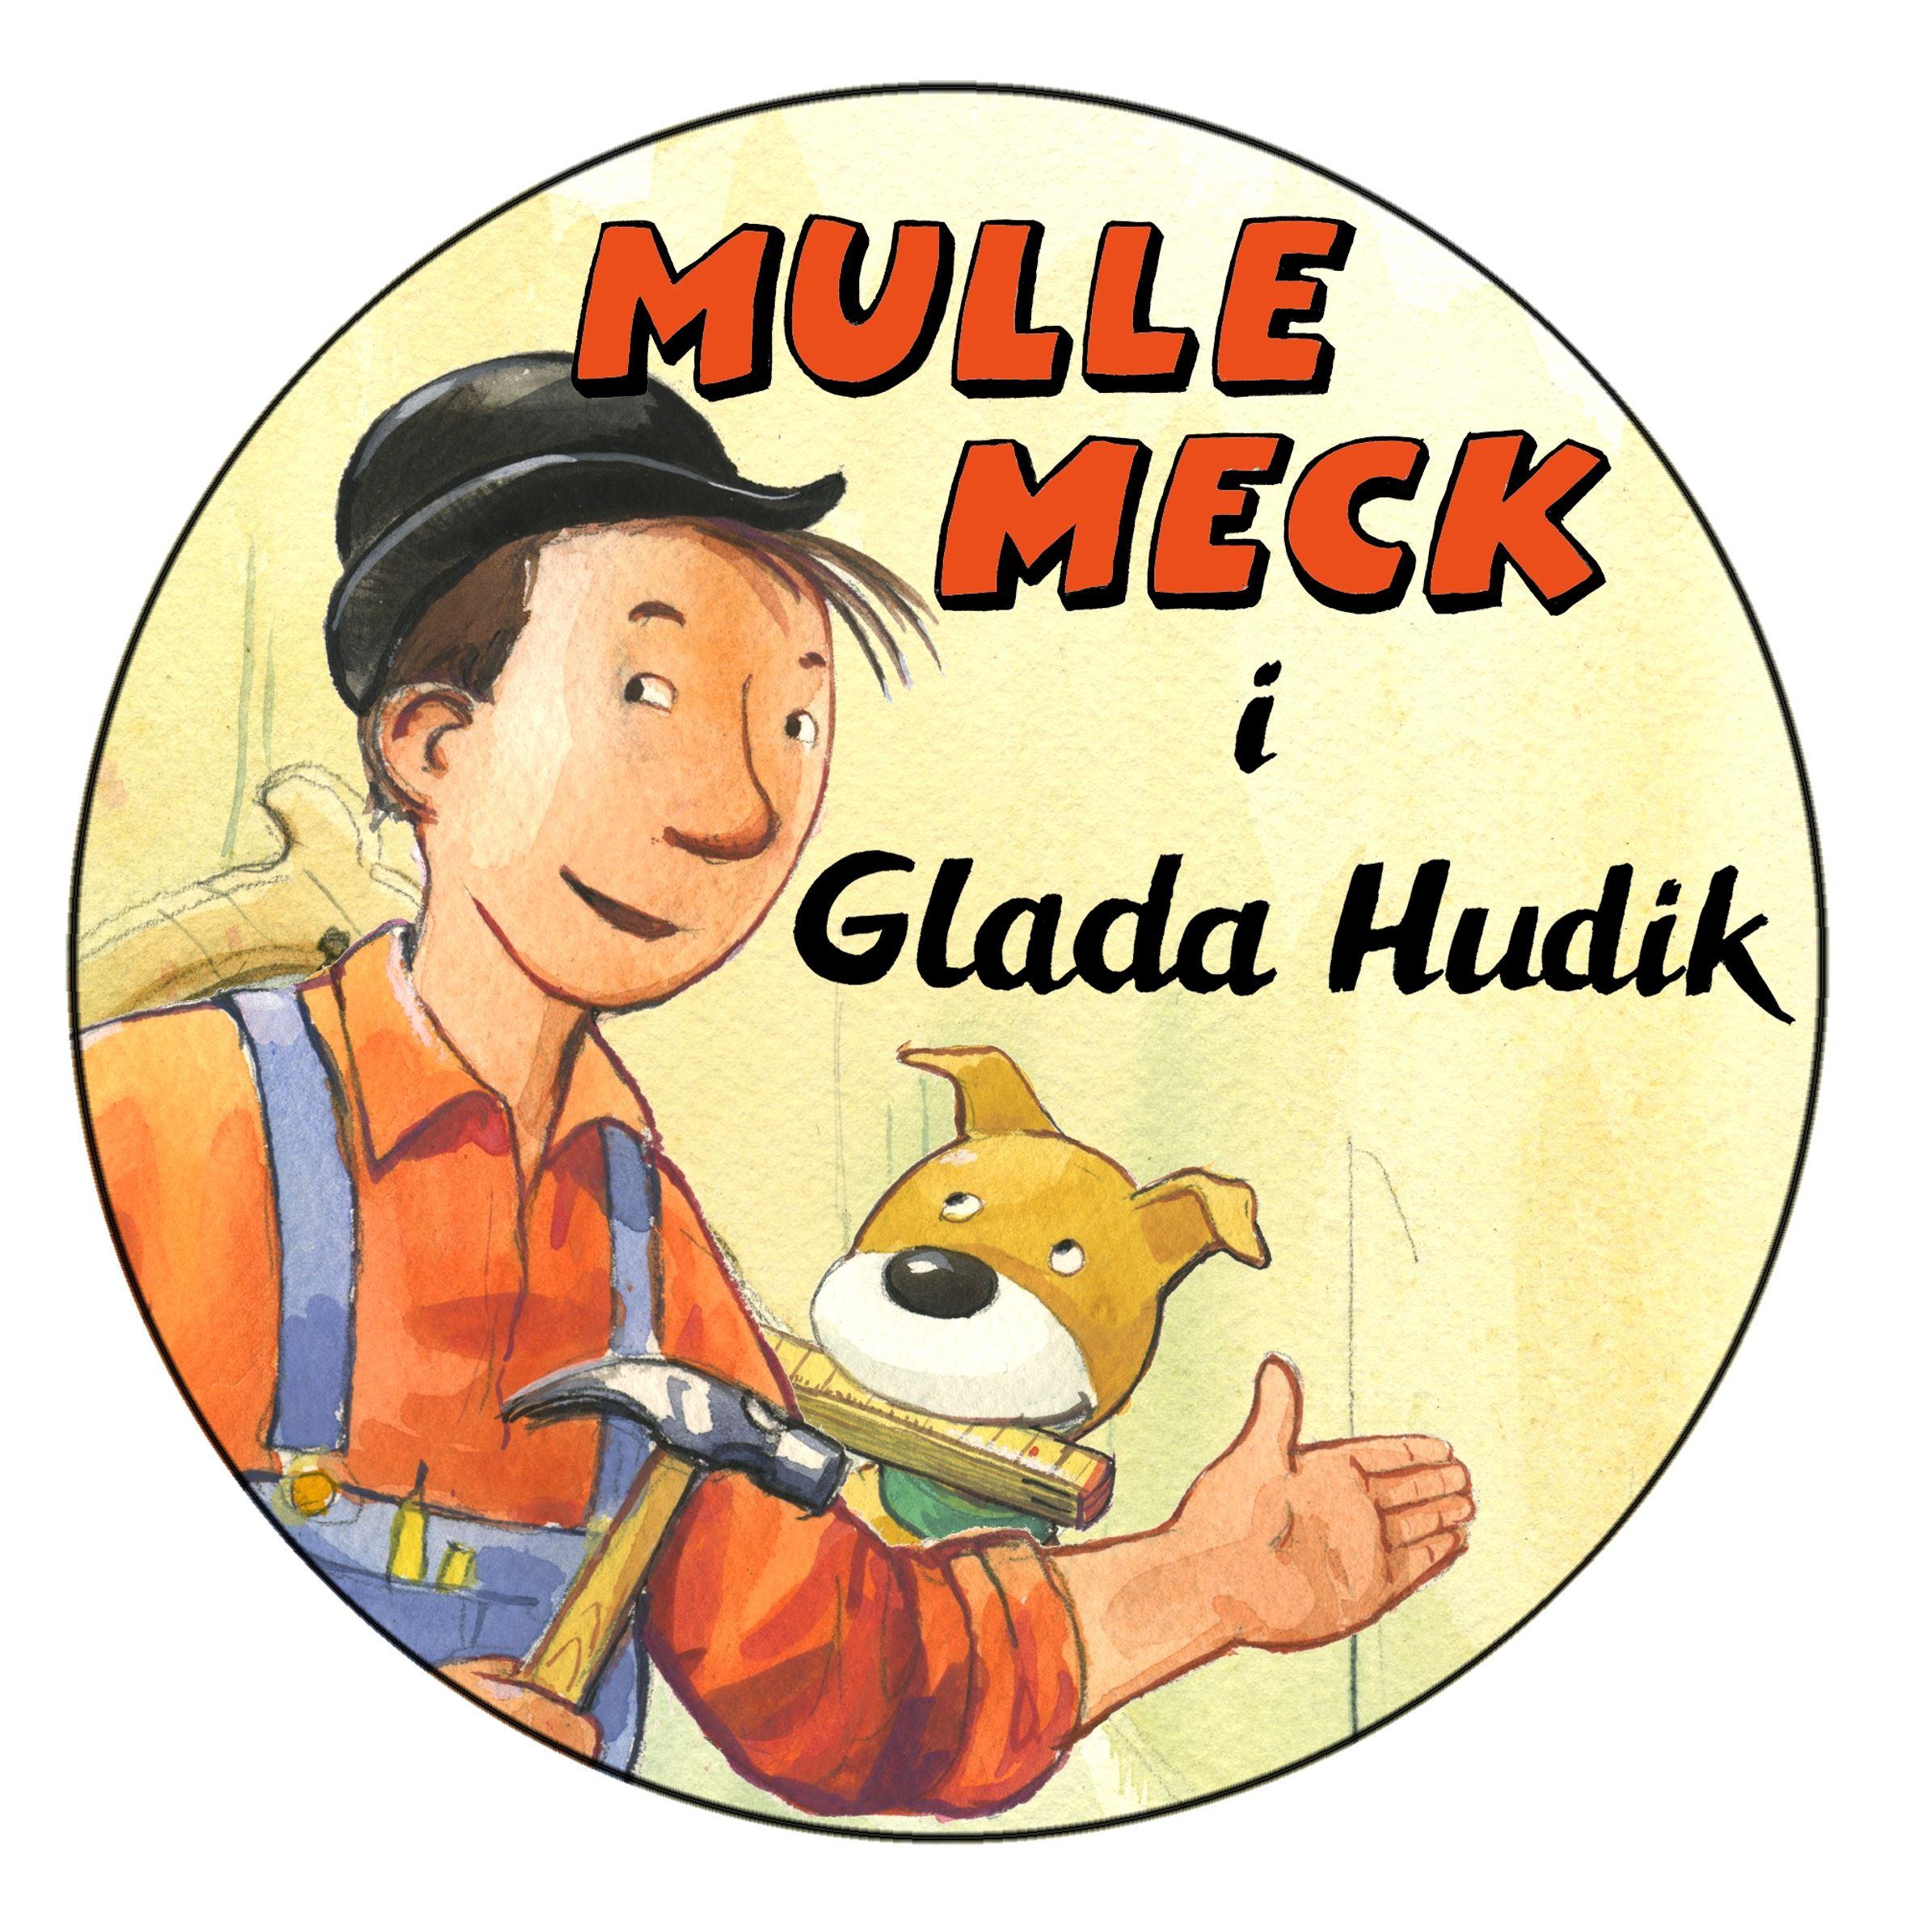 © Mulle Meck i Glada Hudik, Mulle Meck i Glada Hudik